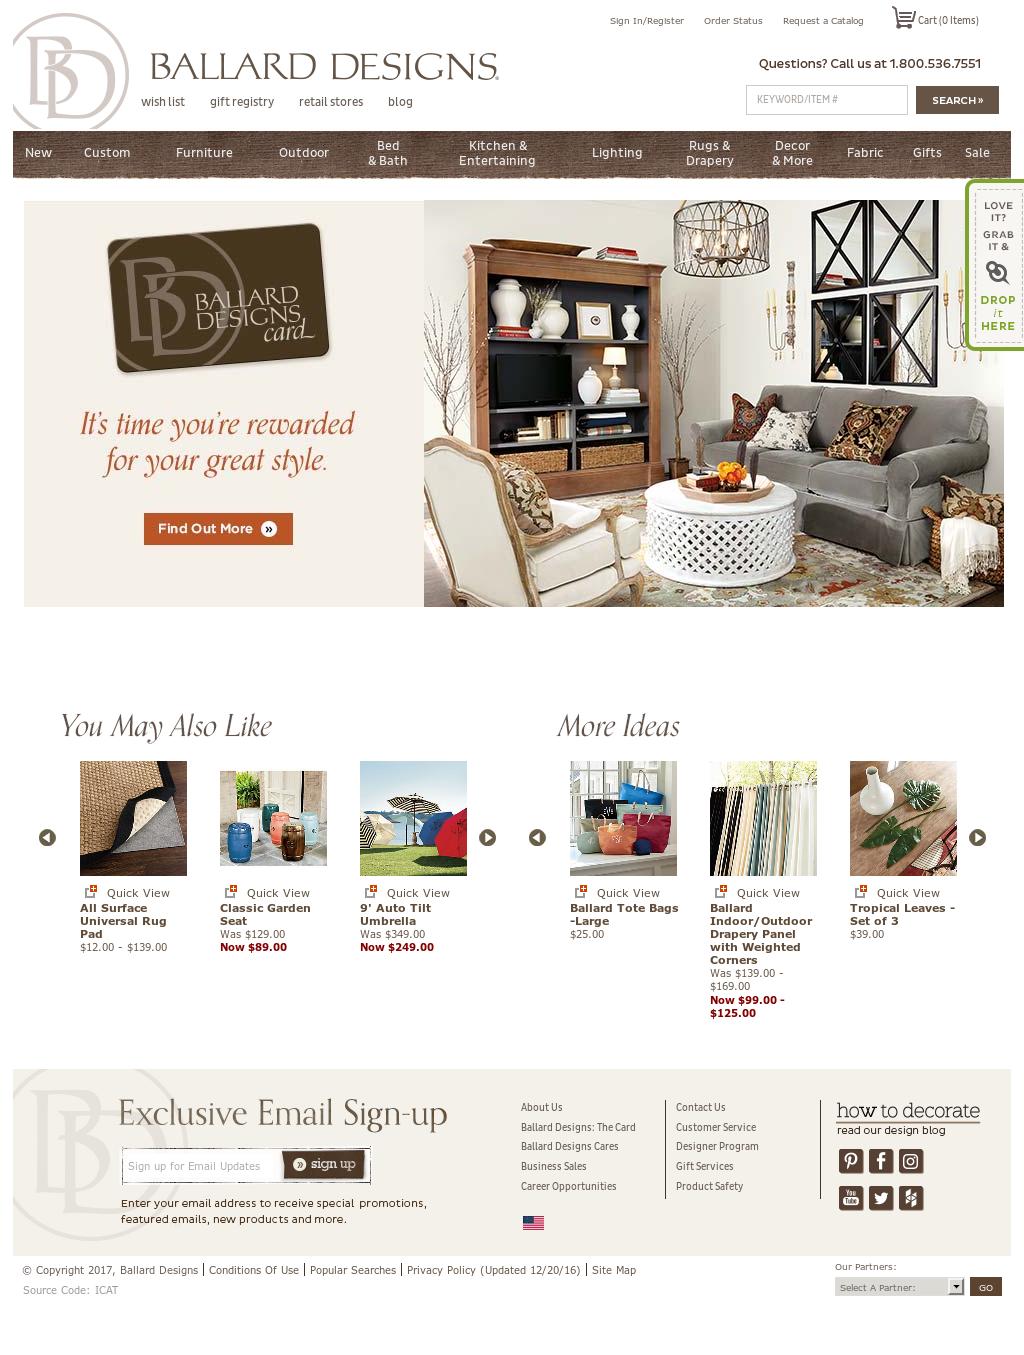 ballard designs competitors, revenue and employees - owler company